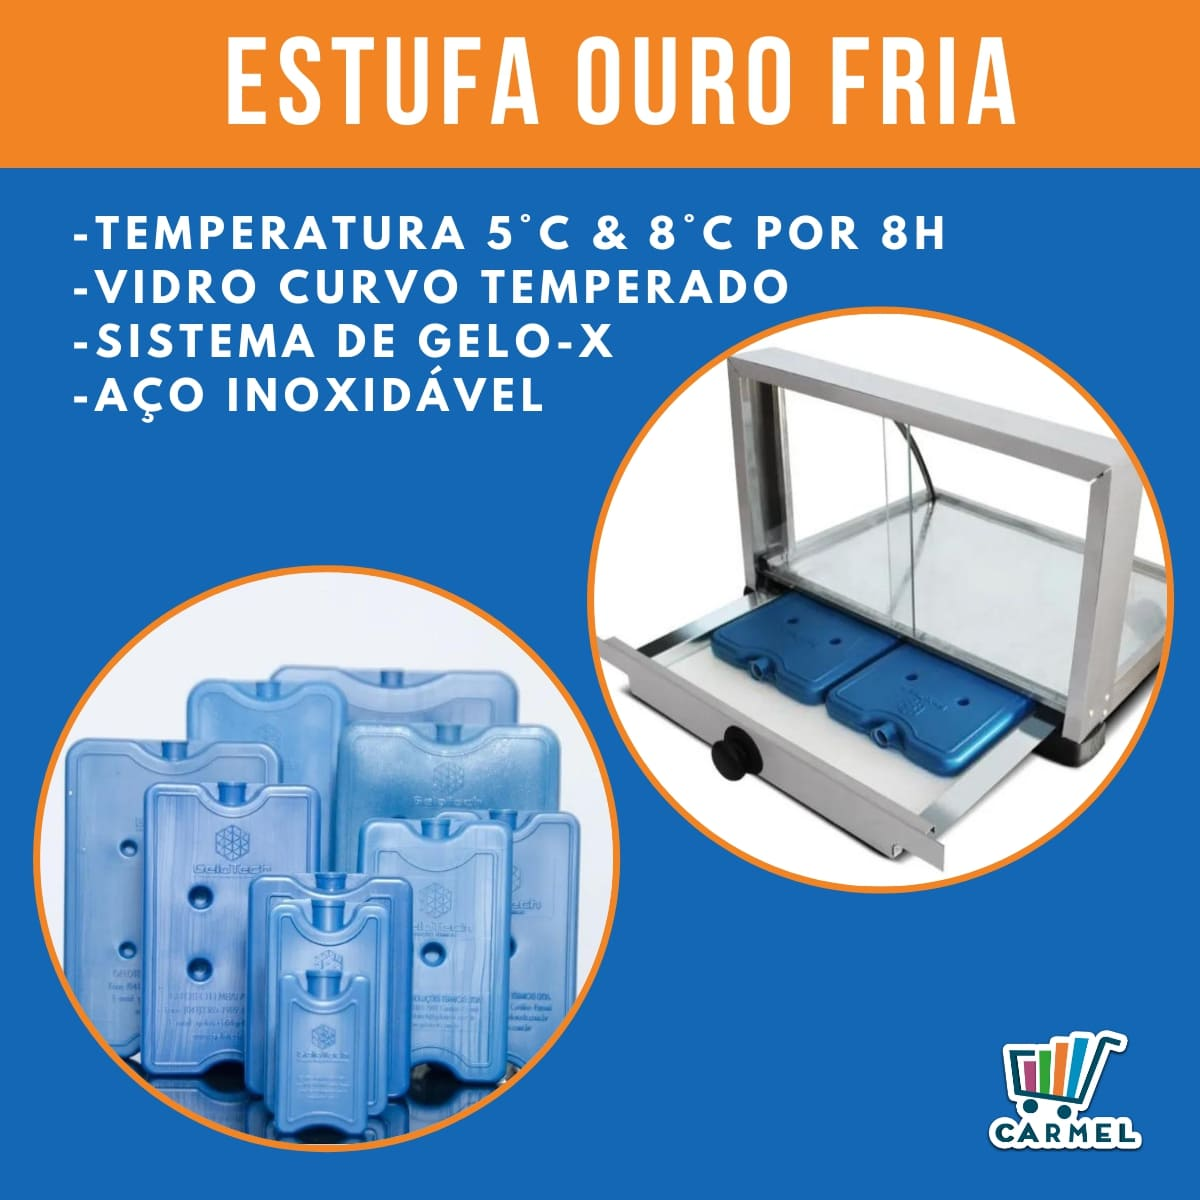 Estufa Fria c/ 6 Gelo-X Marchesoni 55 cm - Ef7030  - Carmel Equipamentos